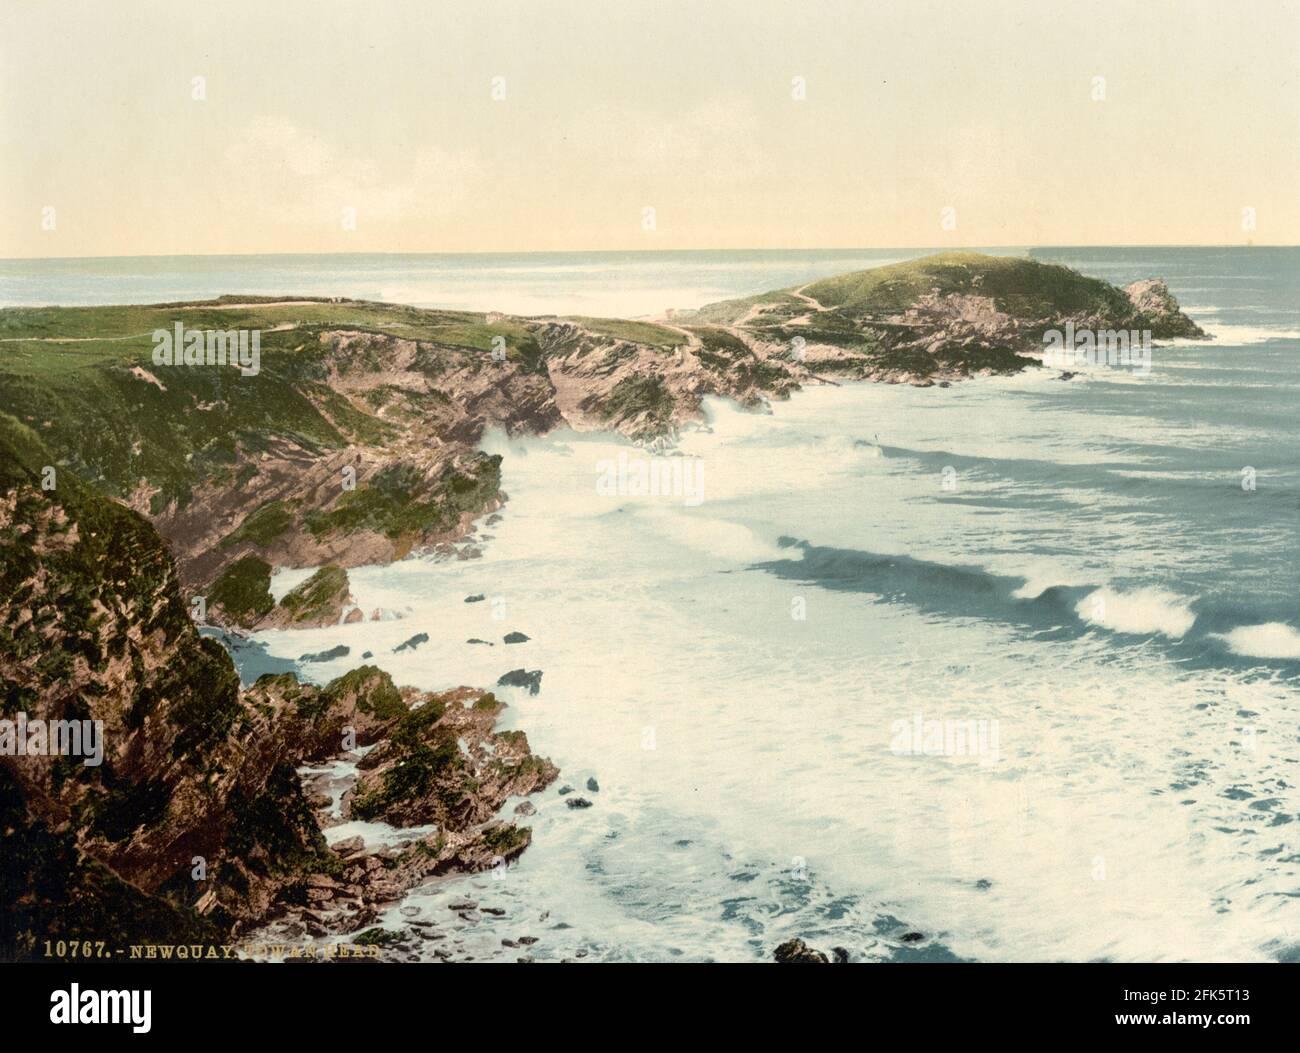 Towan Head near Newquay, Cornwall circa 1890-1900 Stock Photo